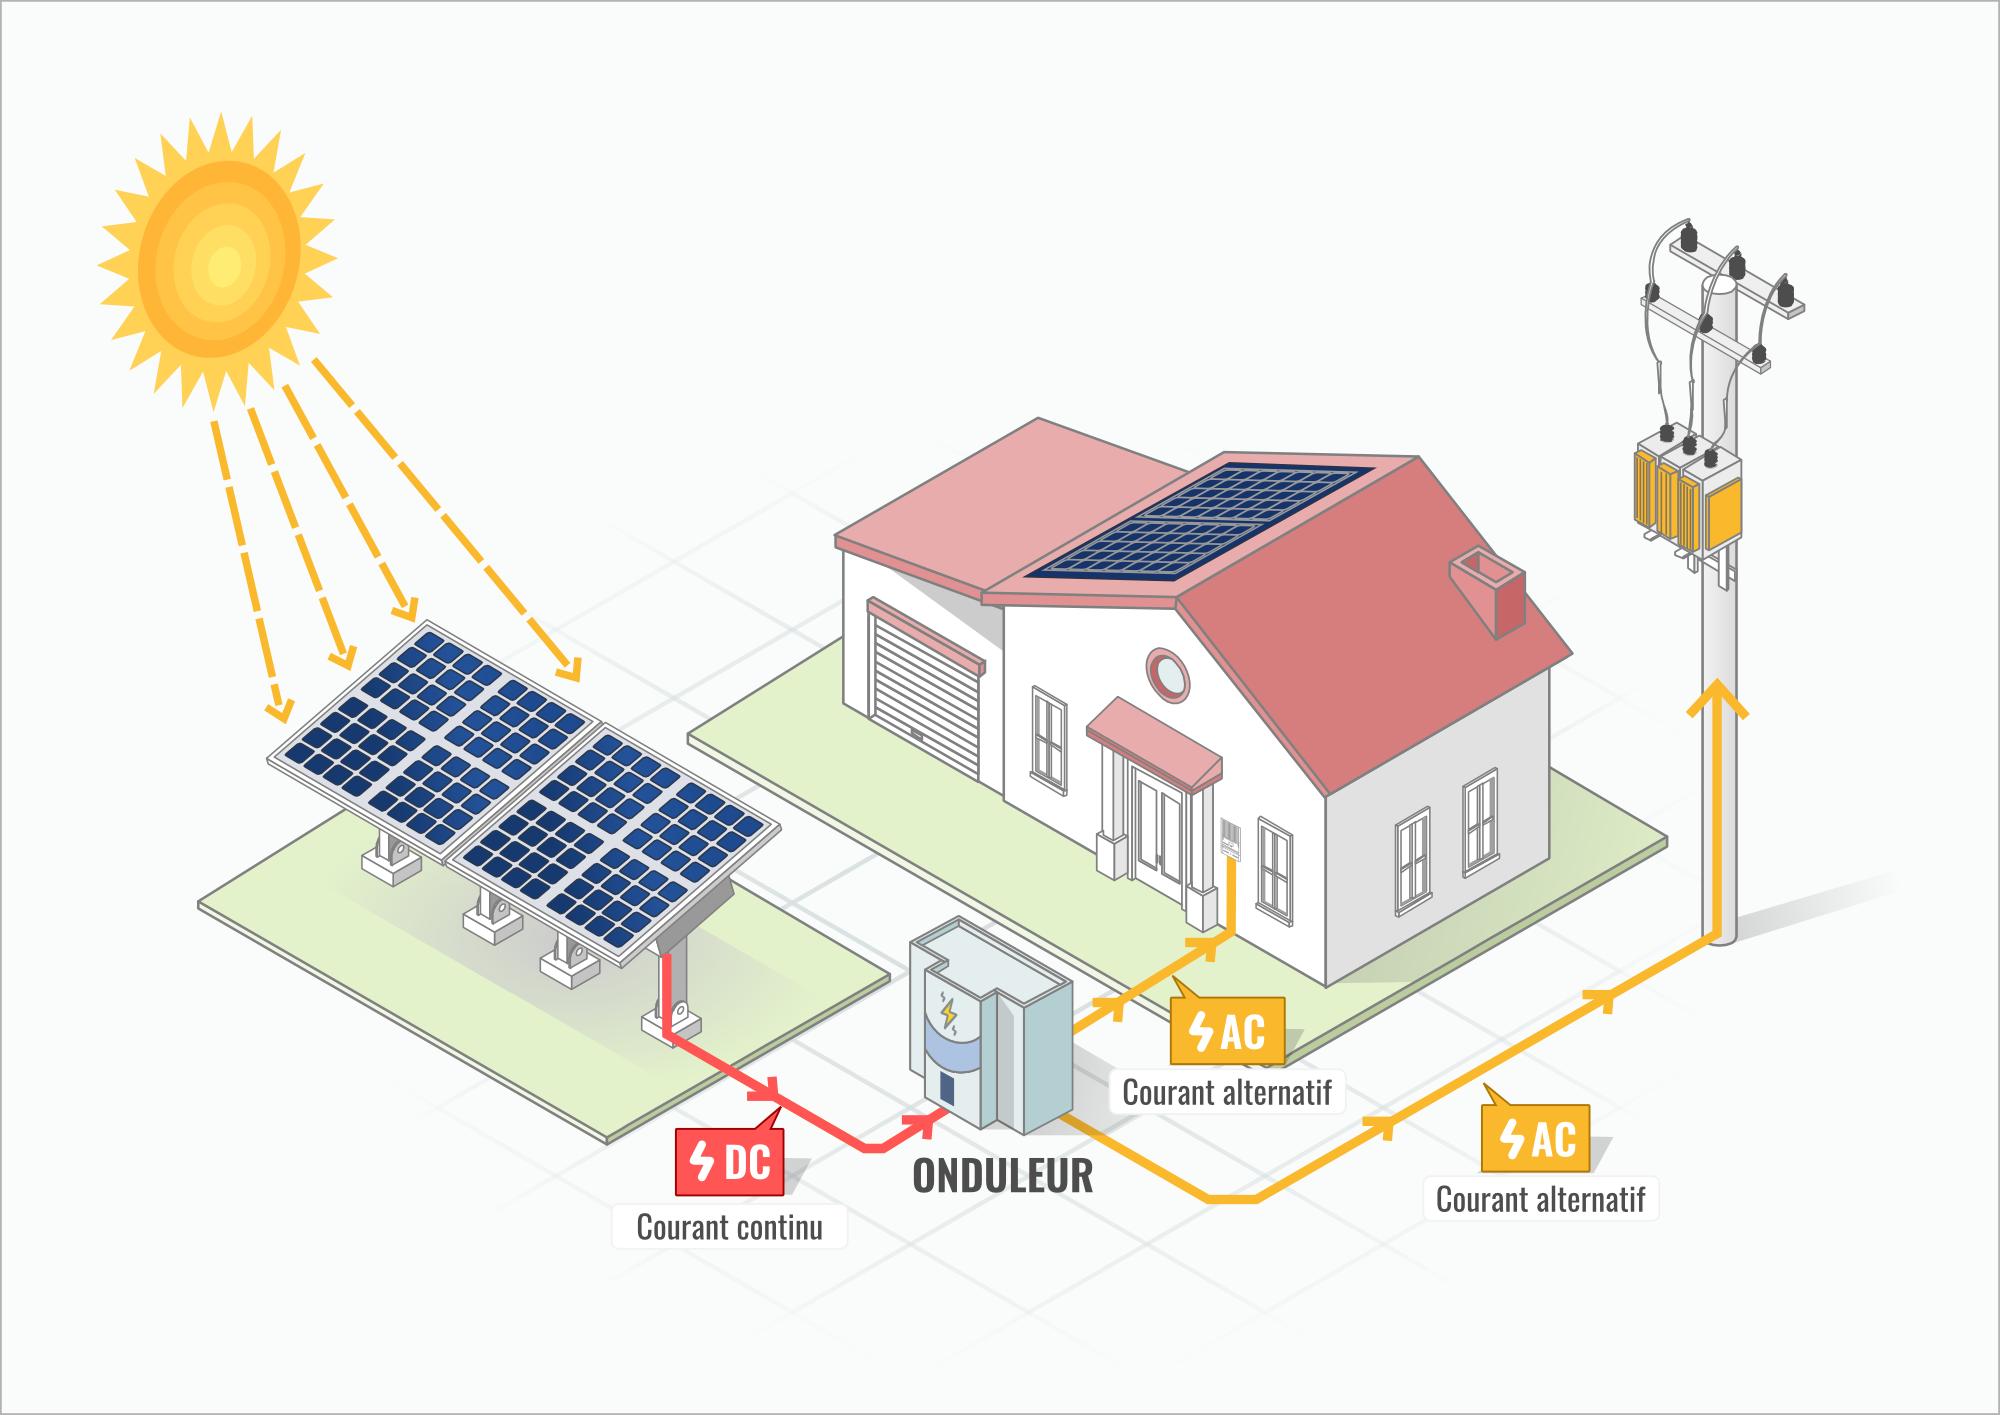 illustrations for a solar panels guide website